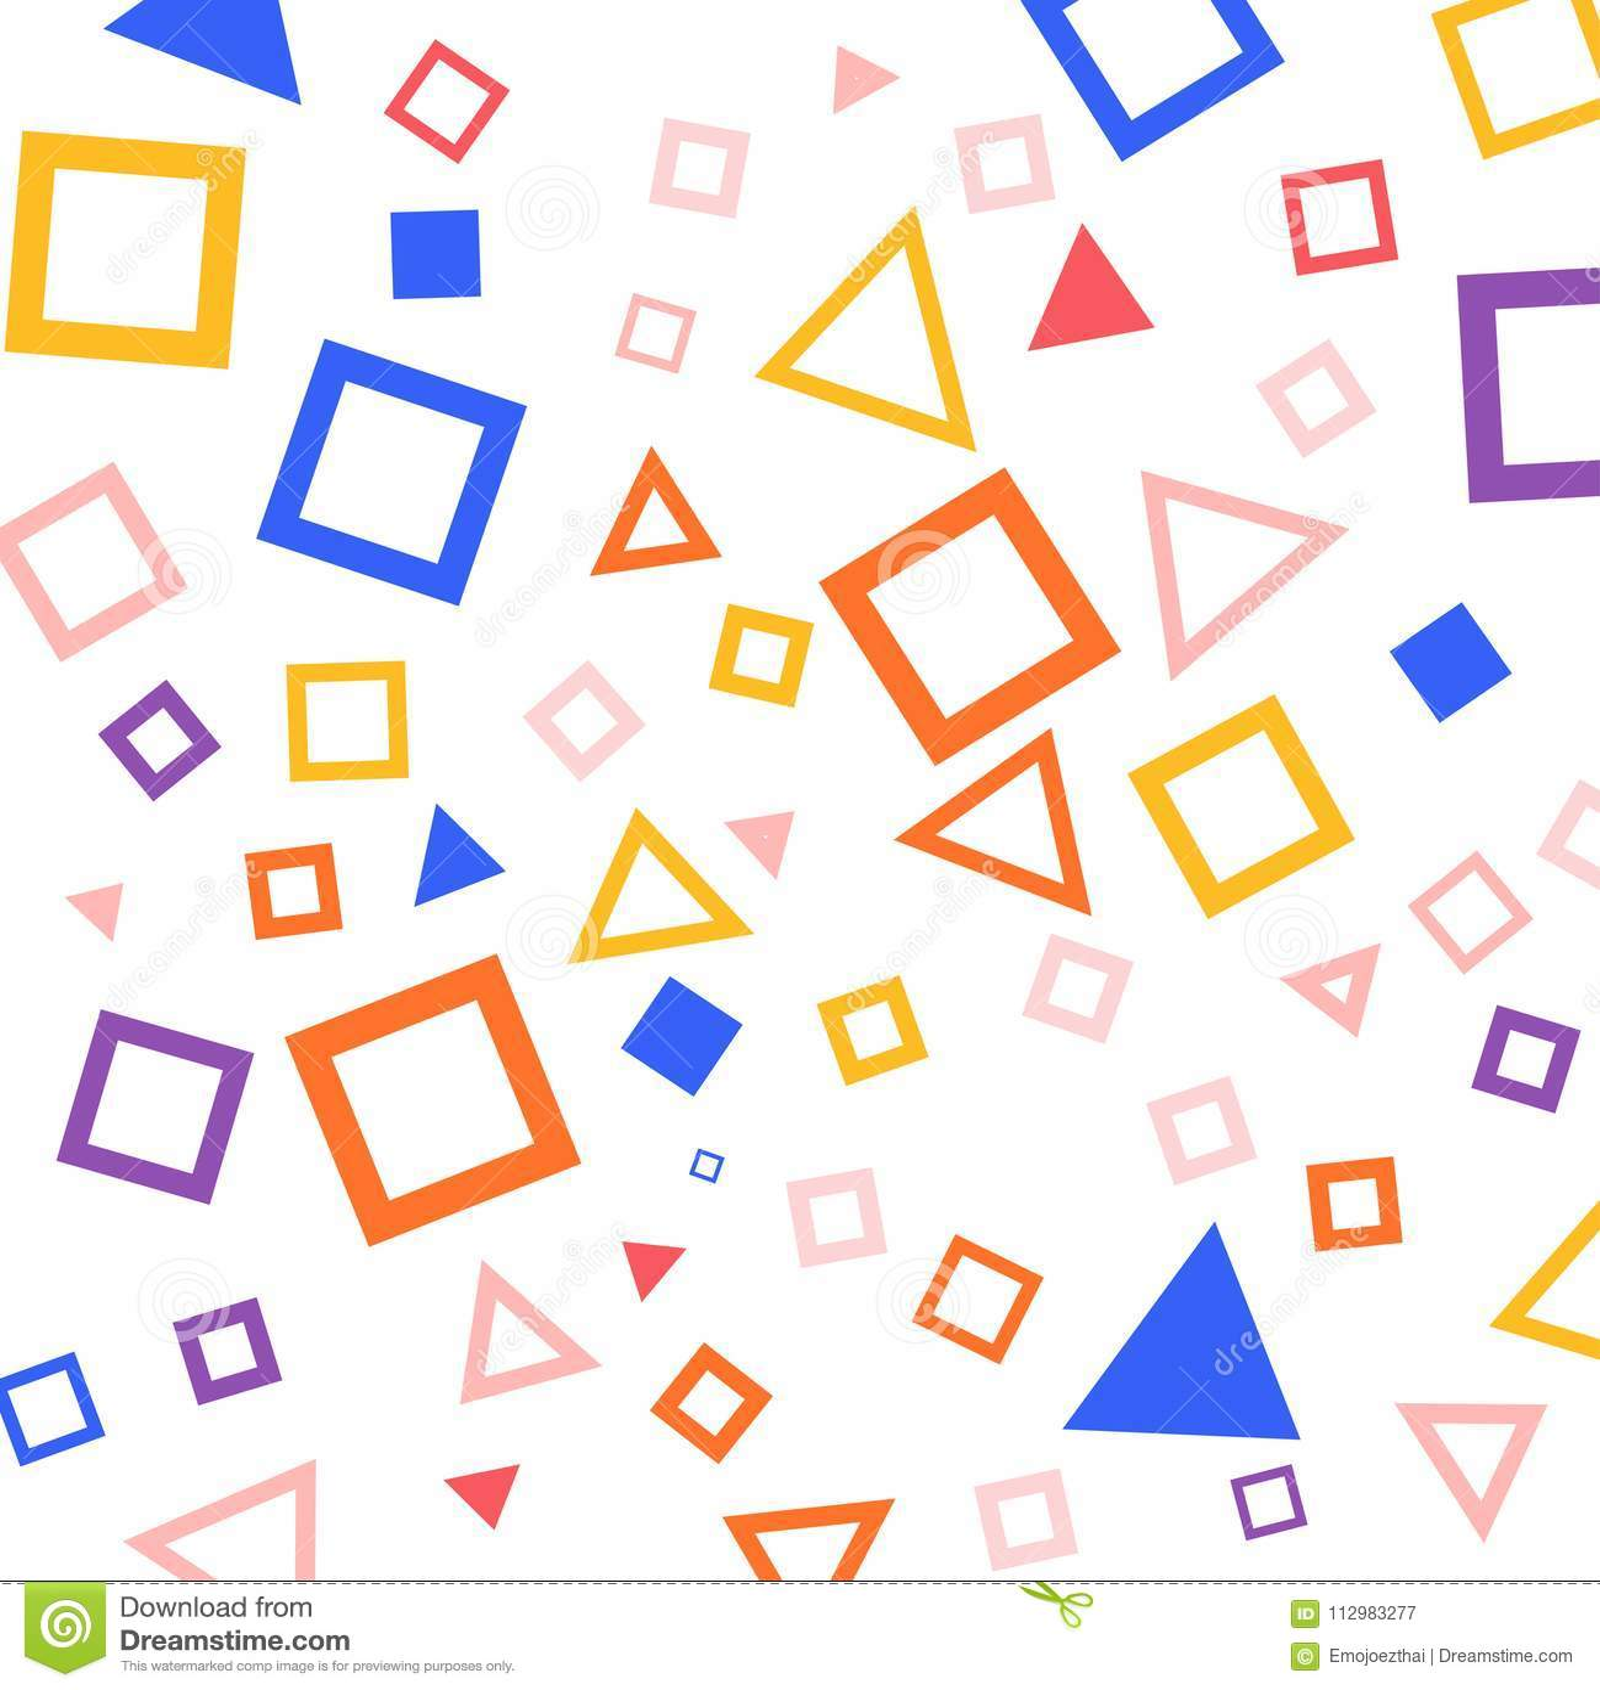 Flat_Design_Backgrounds_22